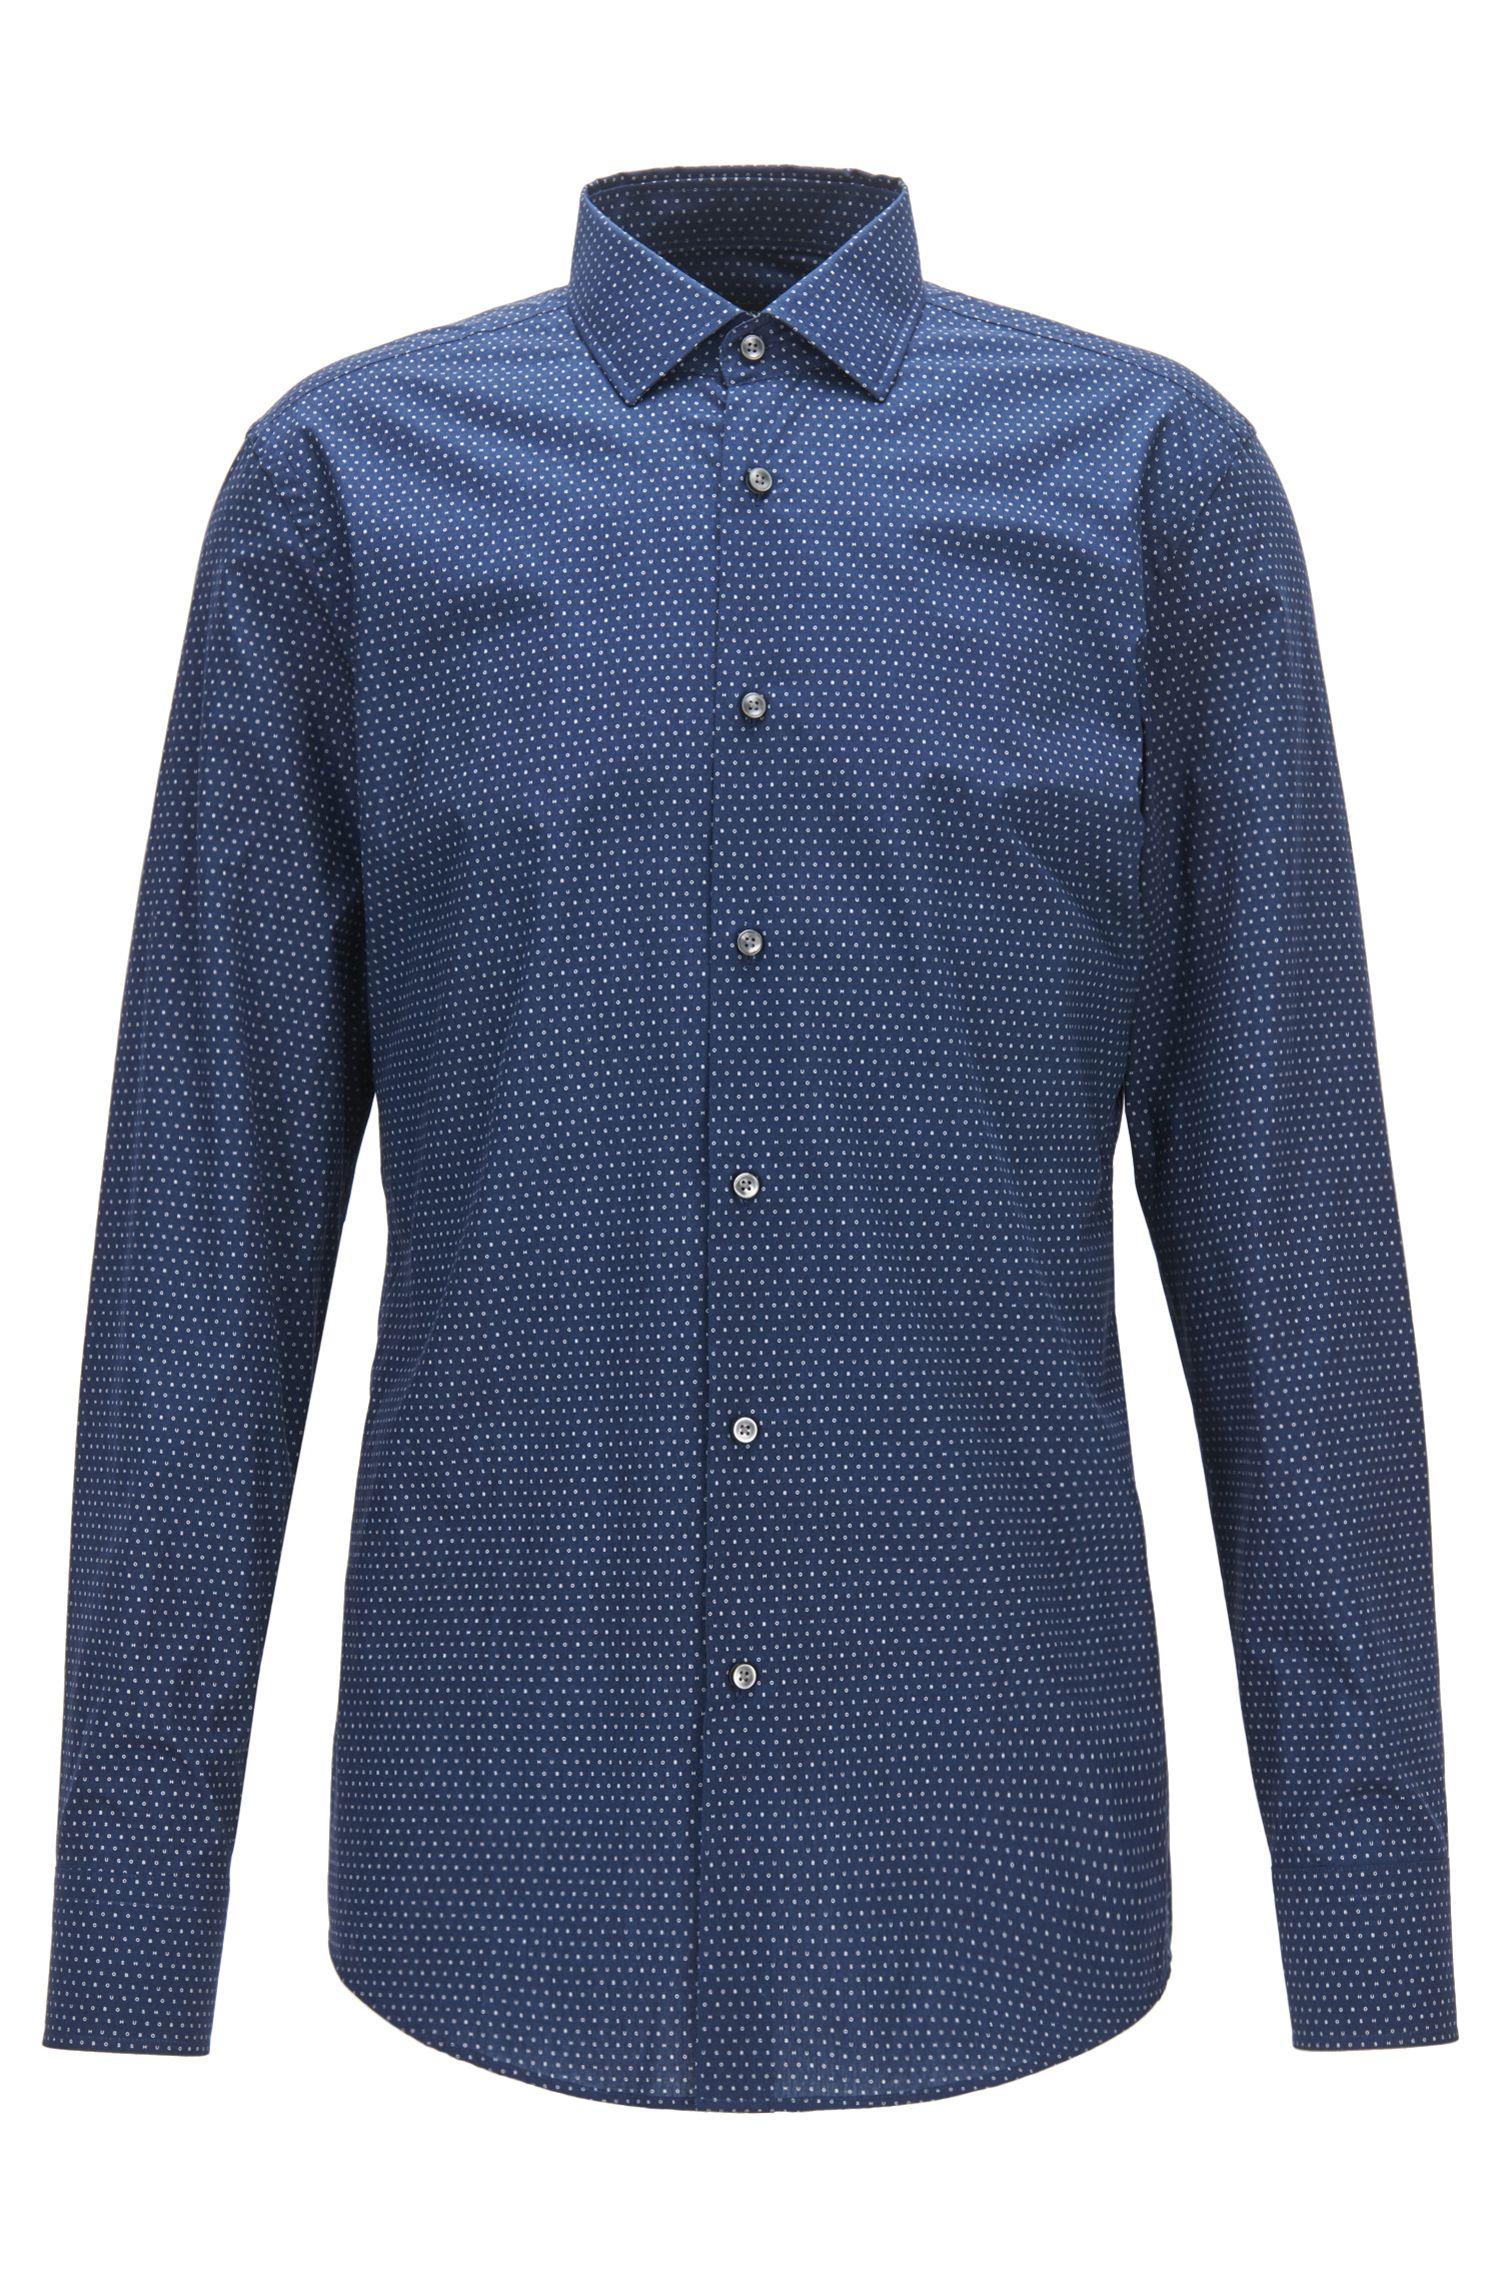 Dotted Cotton Dress Shirt, Slim Fit   Jenno